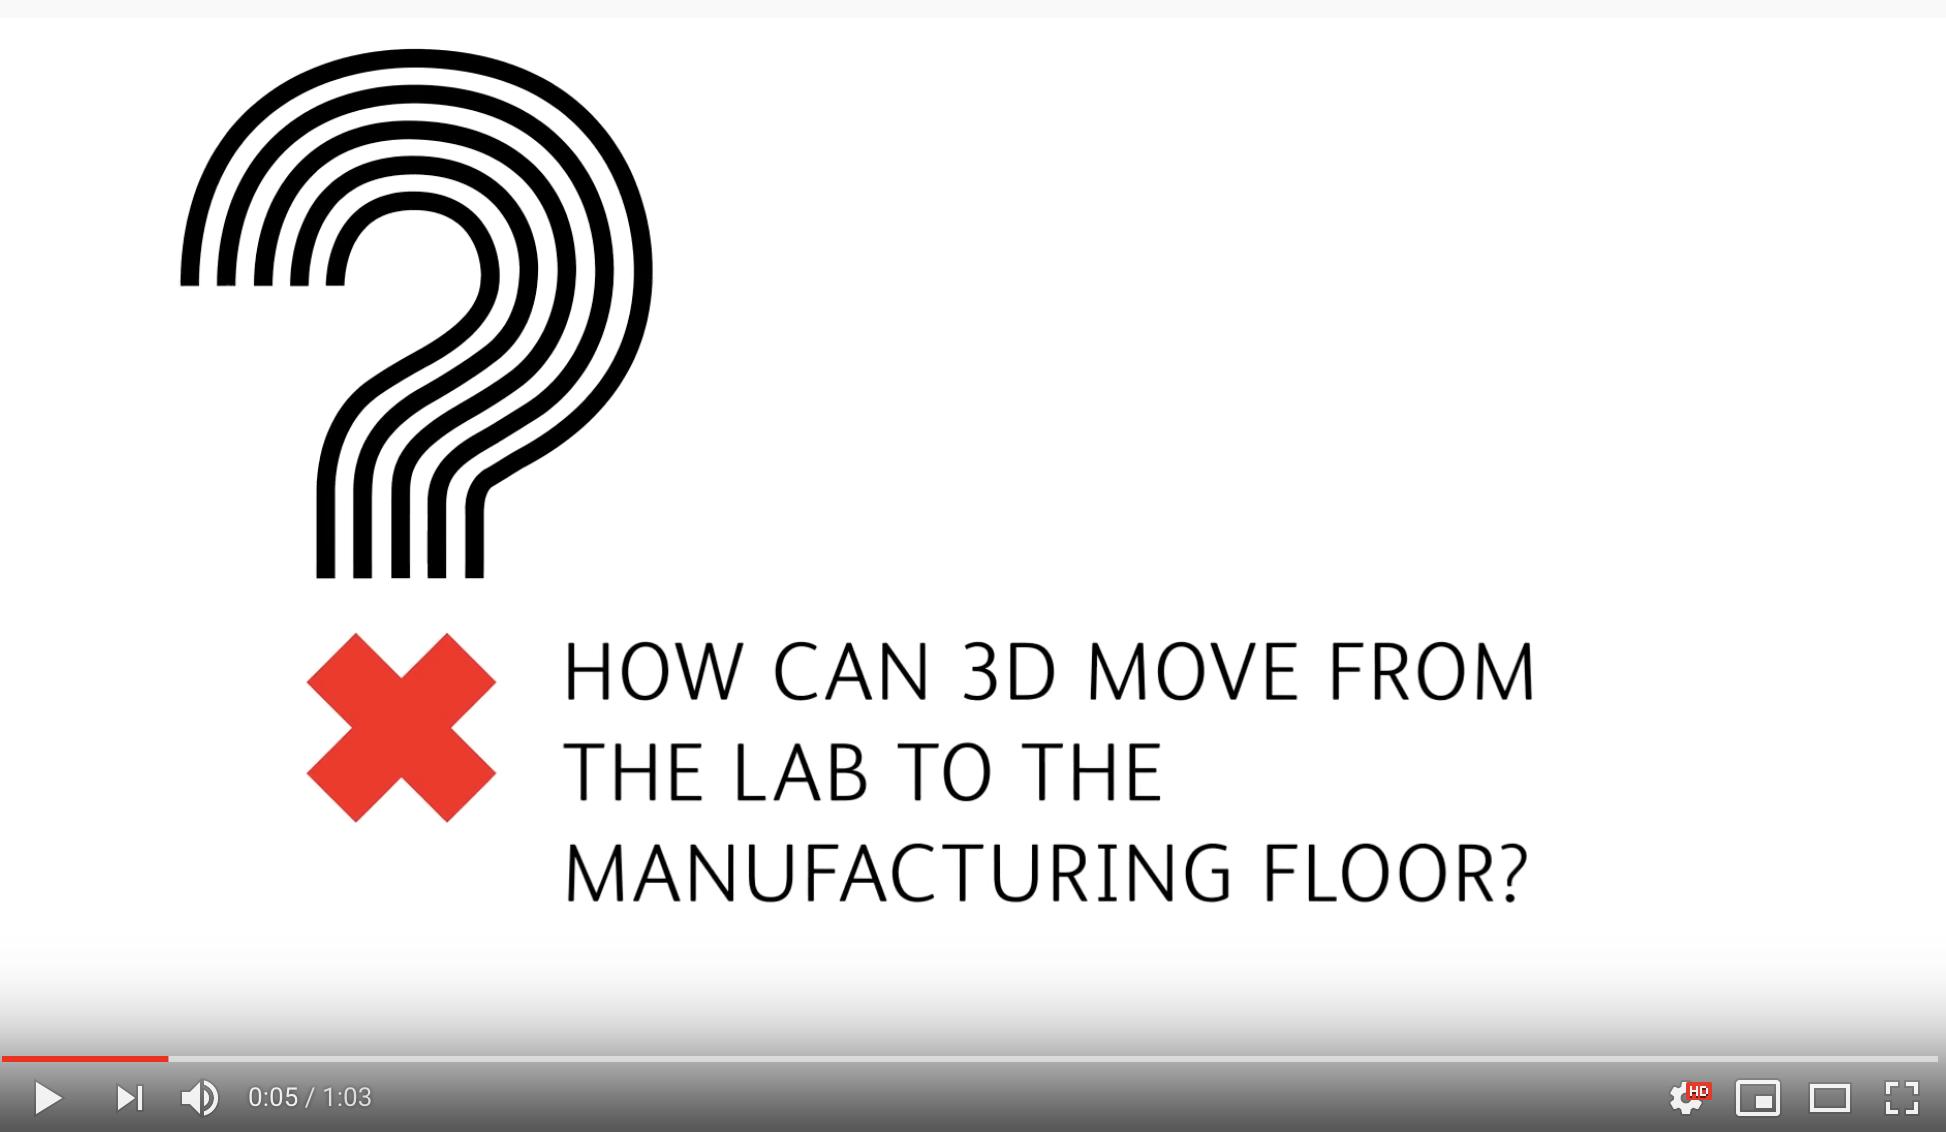 3D Printing by Xerox